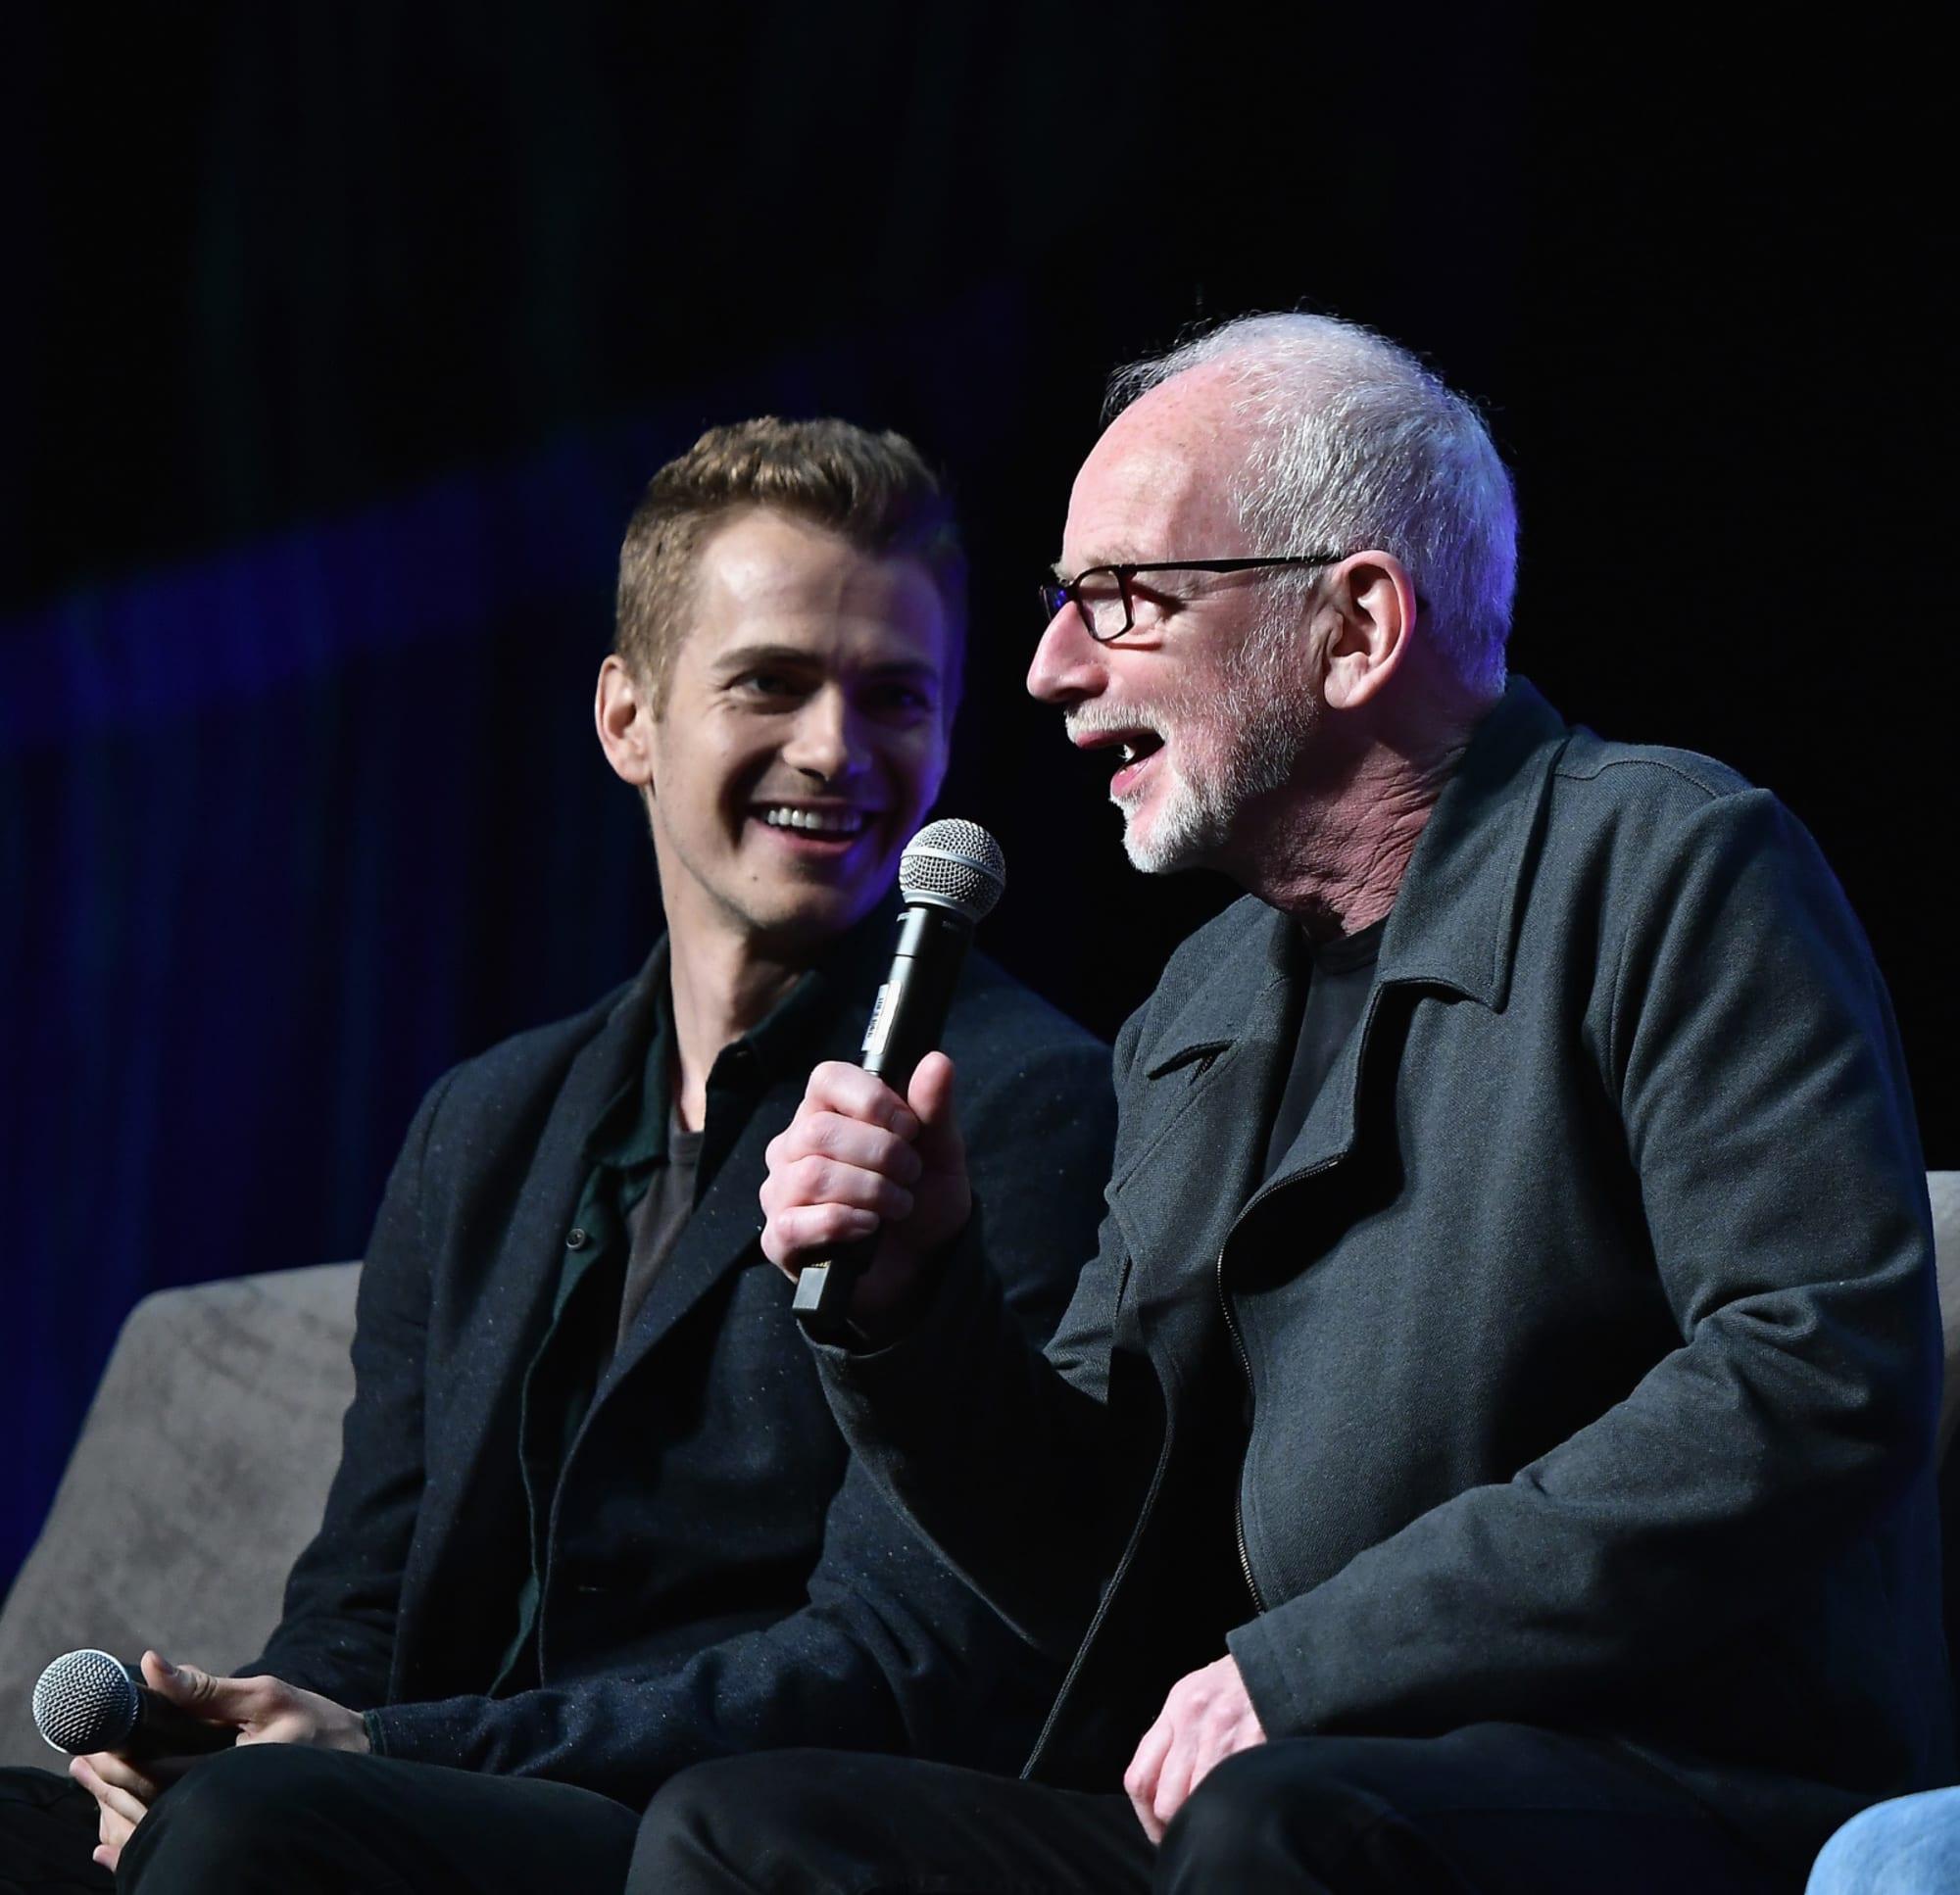 Star Wars More Evidence That Hayden Christensen Could Return As Anakin